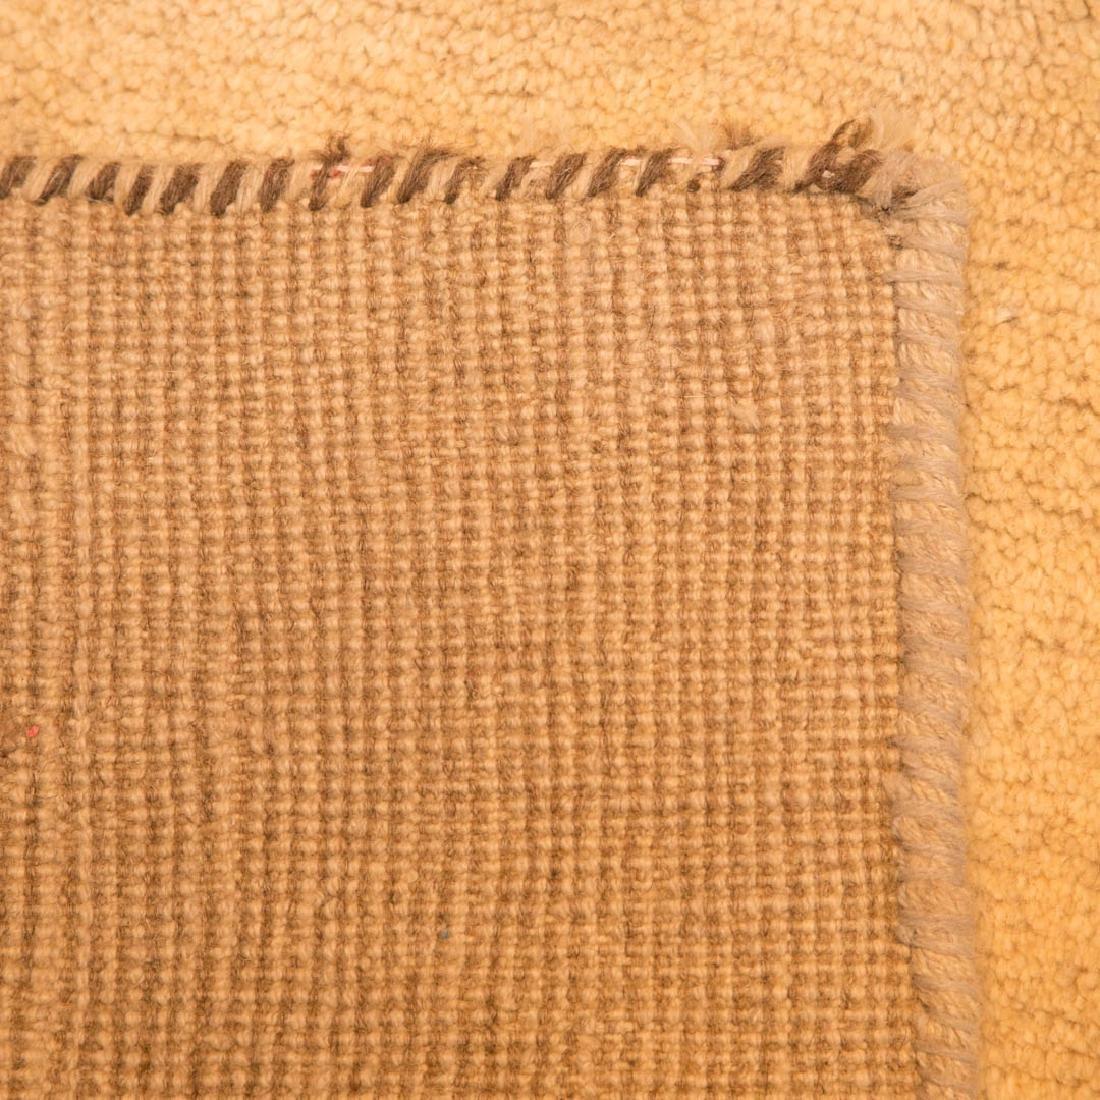 Persian Gabbeh rug, approx. 5.2 x 7.7 - 3